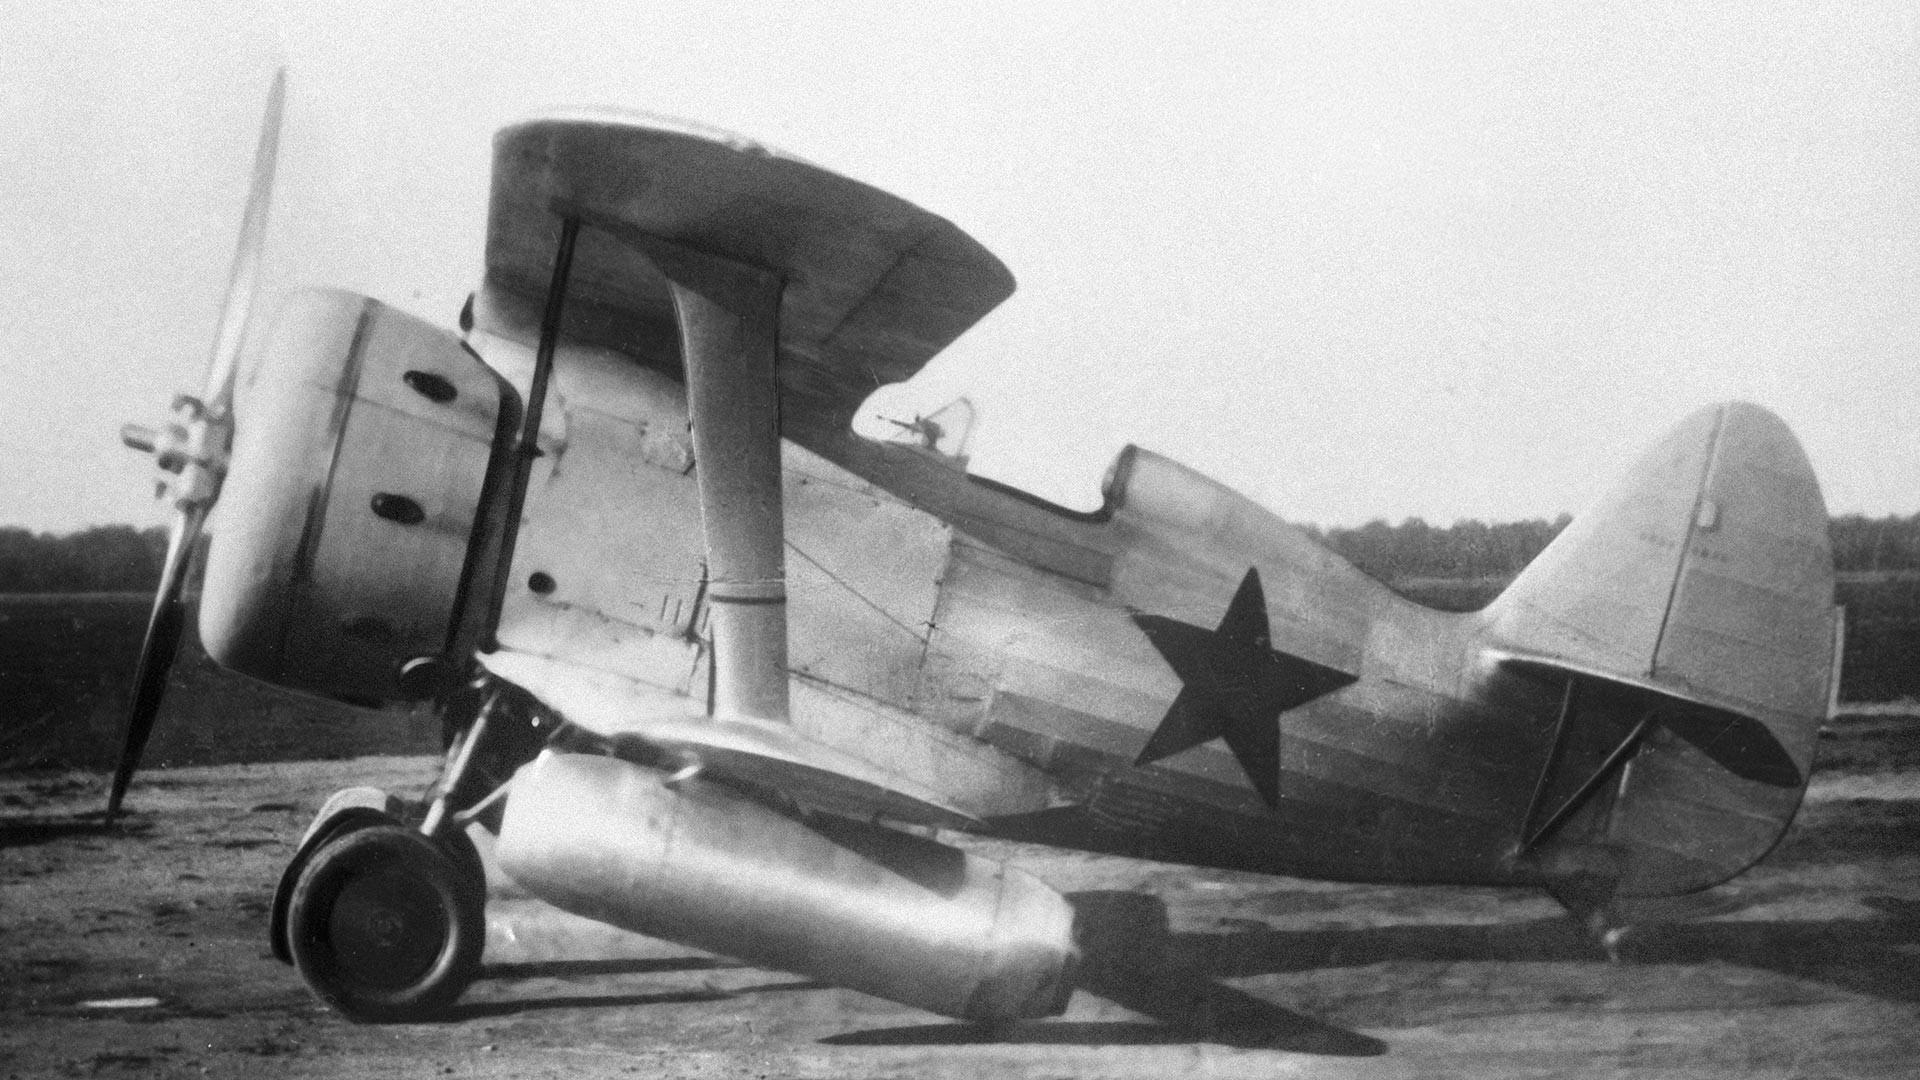 Самолет I-153 от конструктора Николай Николаевич Поликарпов.